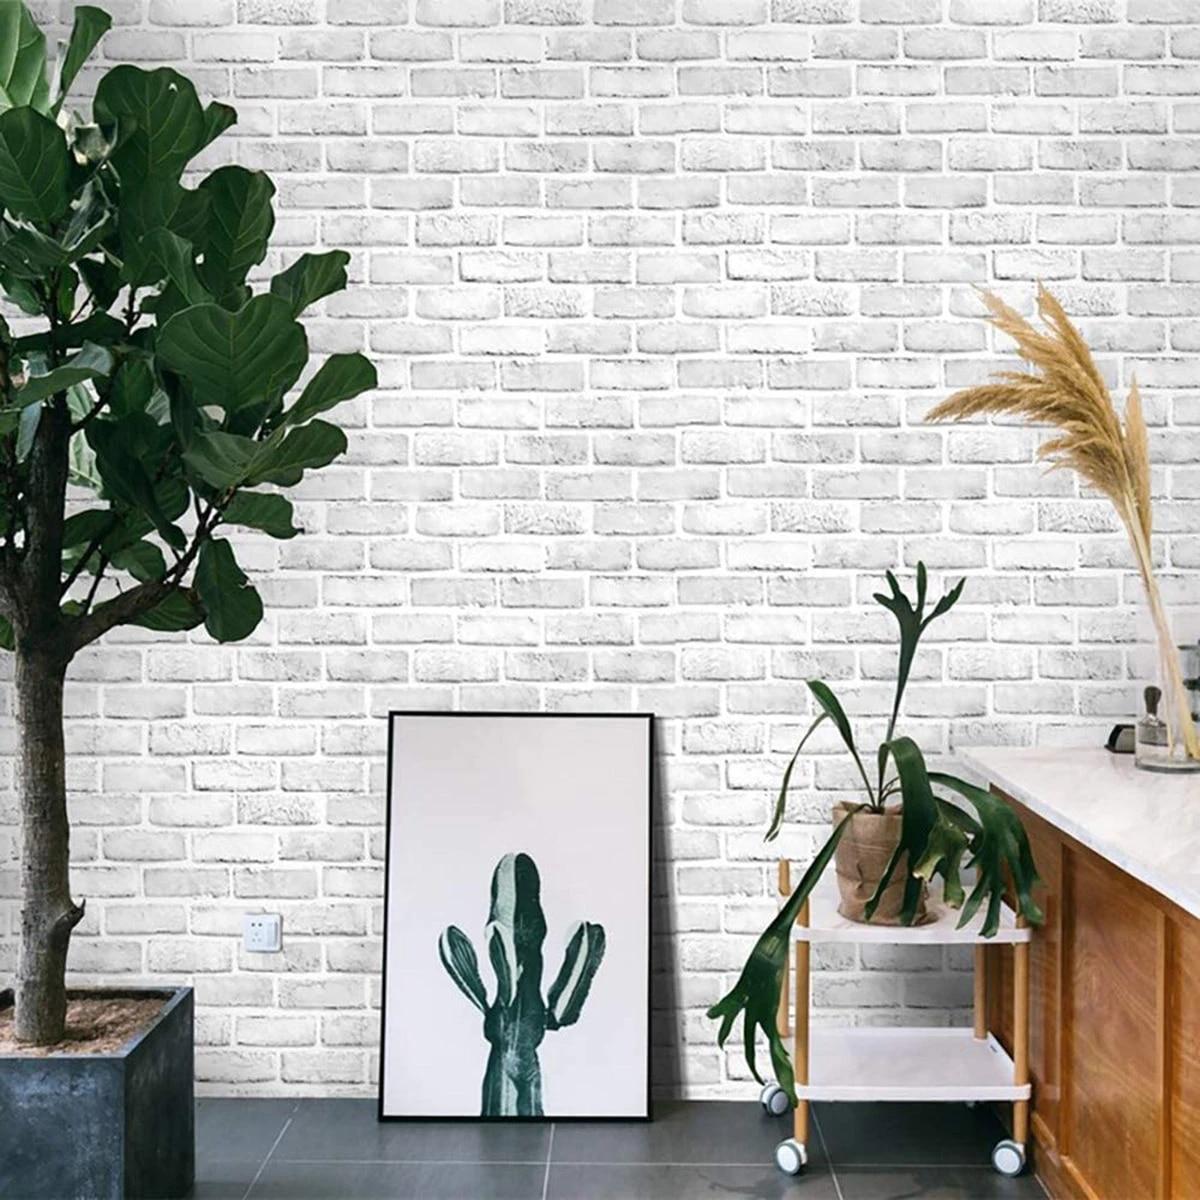 3D Brick Wallpaper Creative Textured ...